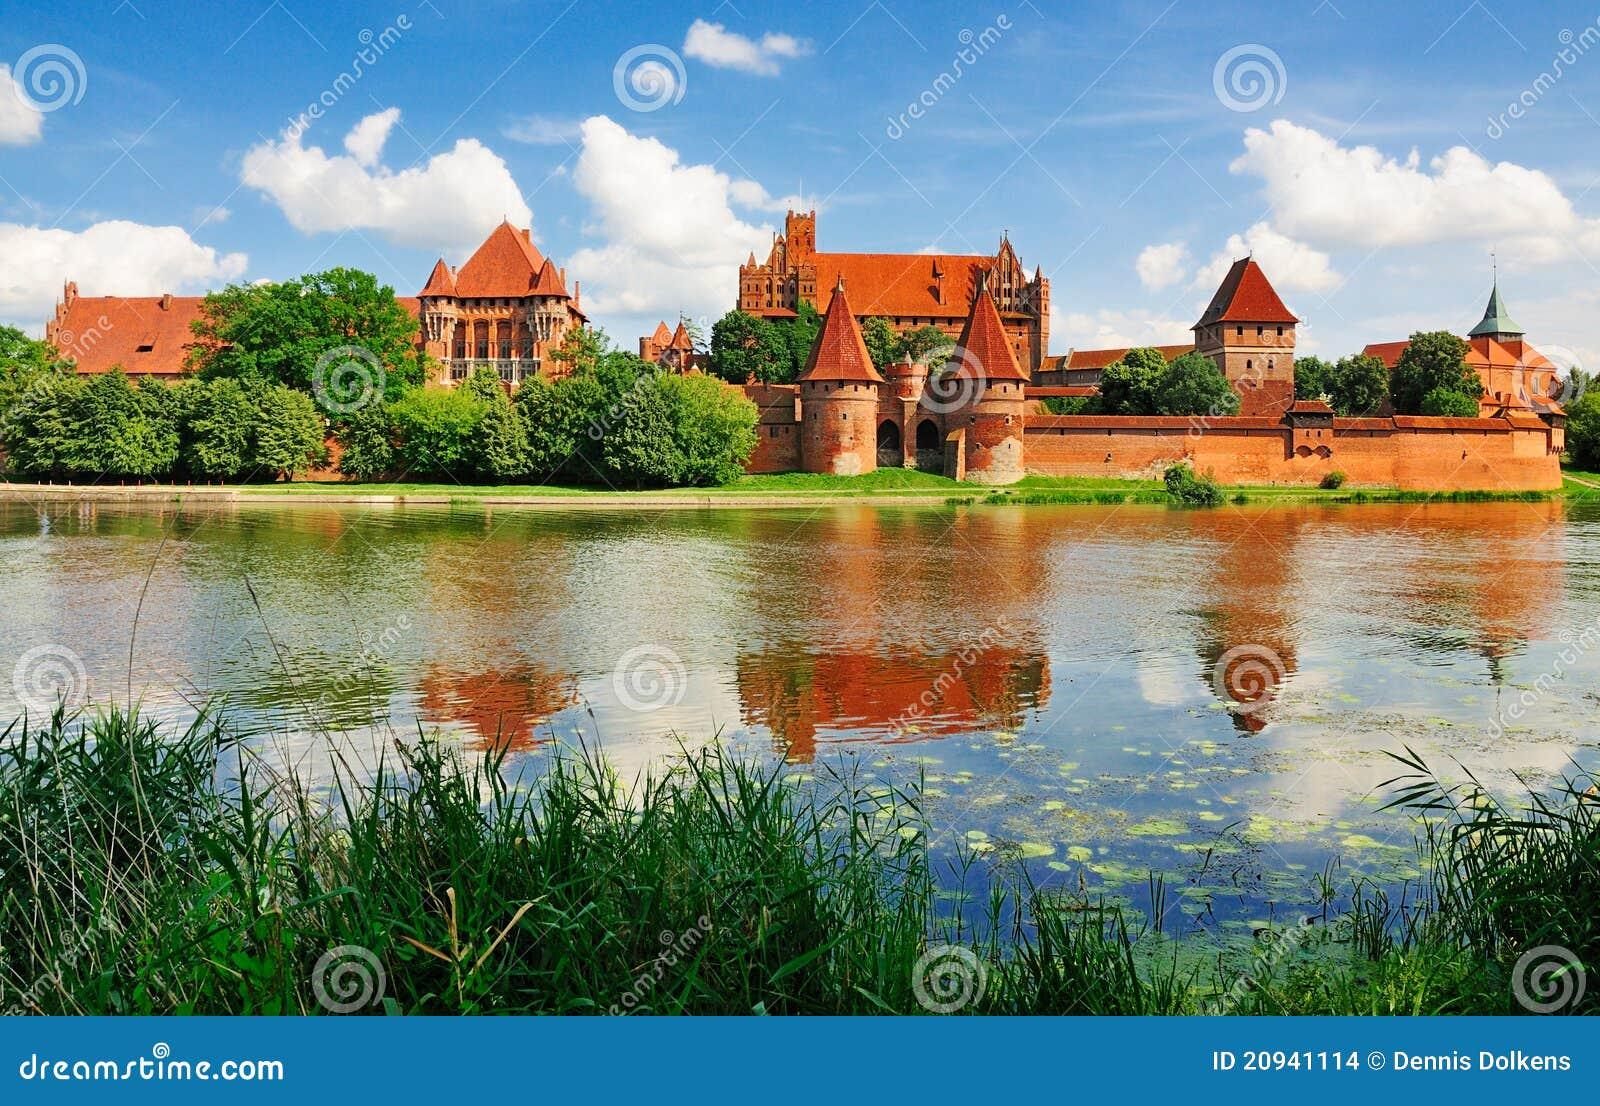 Malbork Castle, Poland